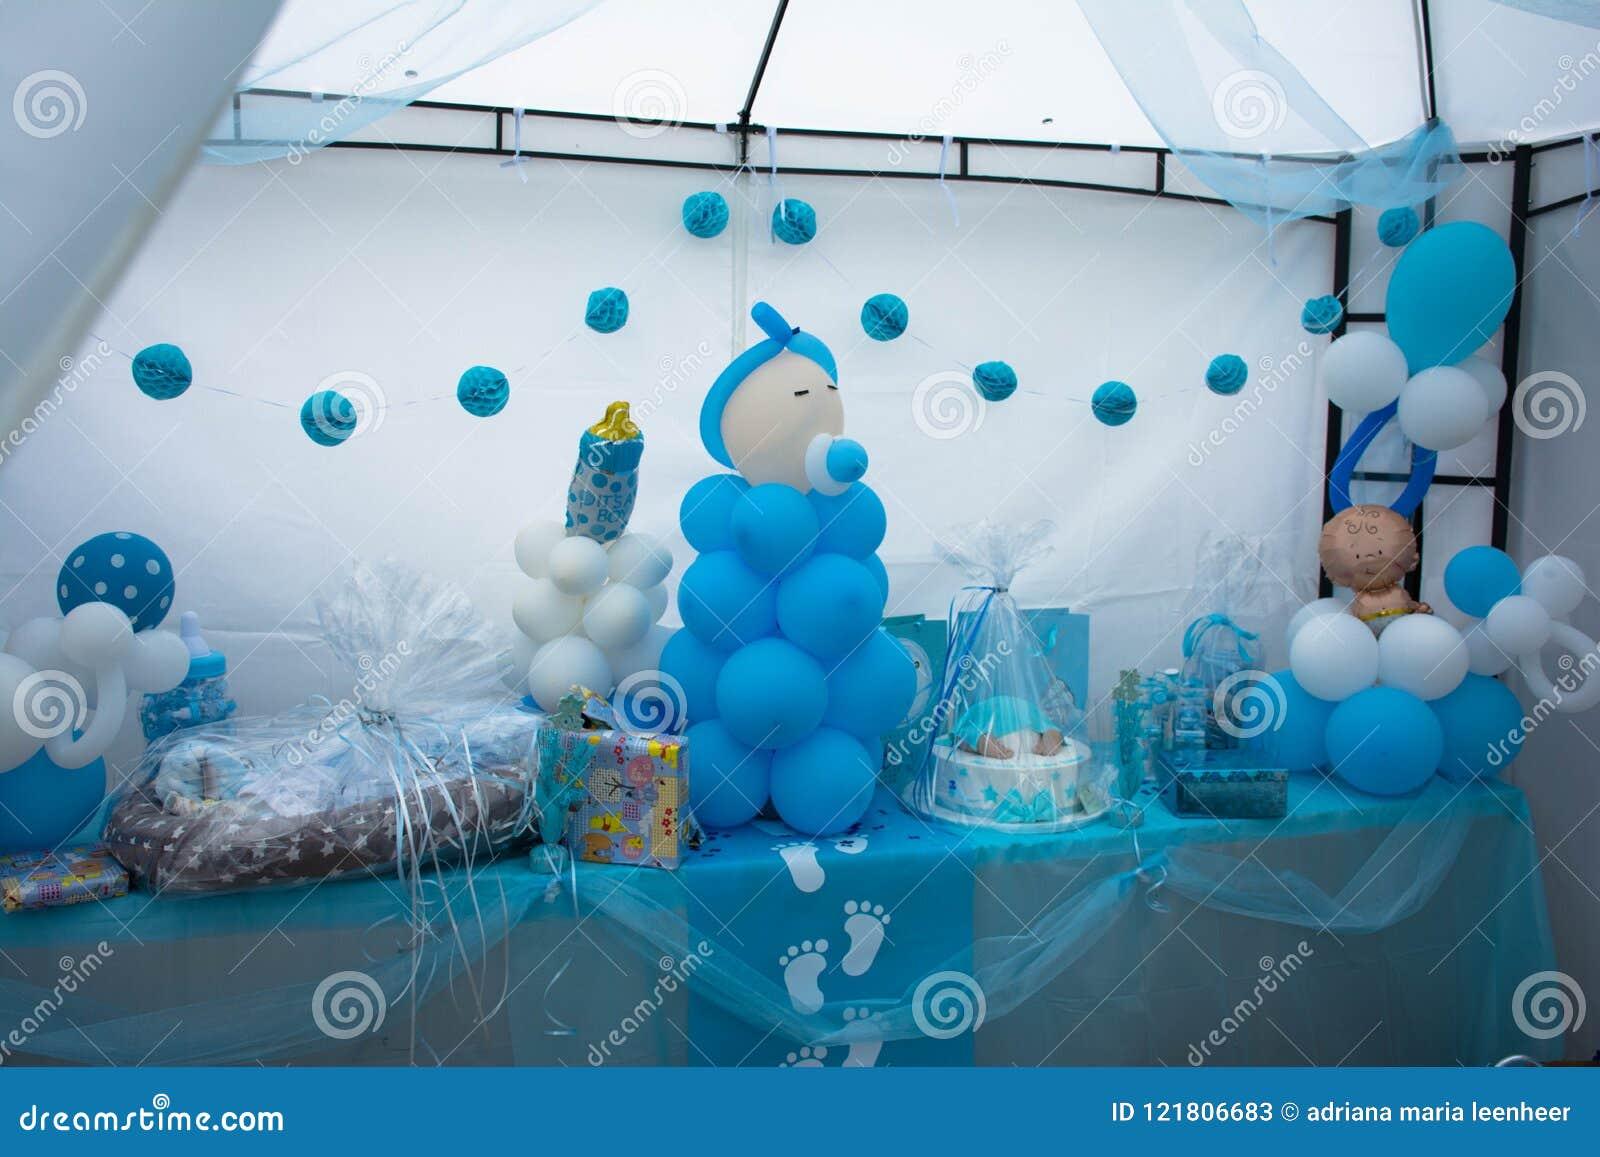 Babyshower Presents On A Table Stock Image Image Of Babyshower